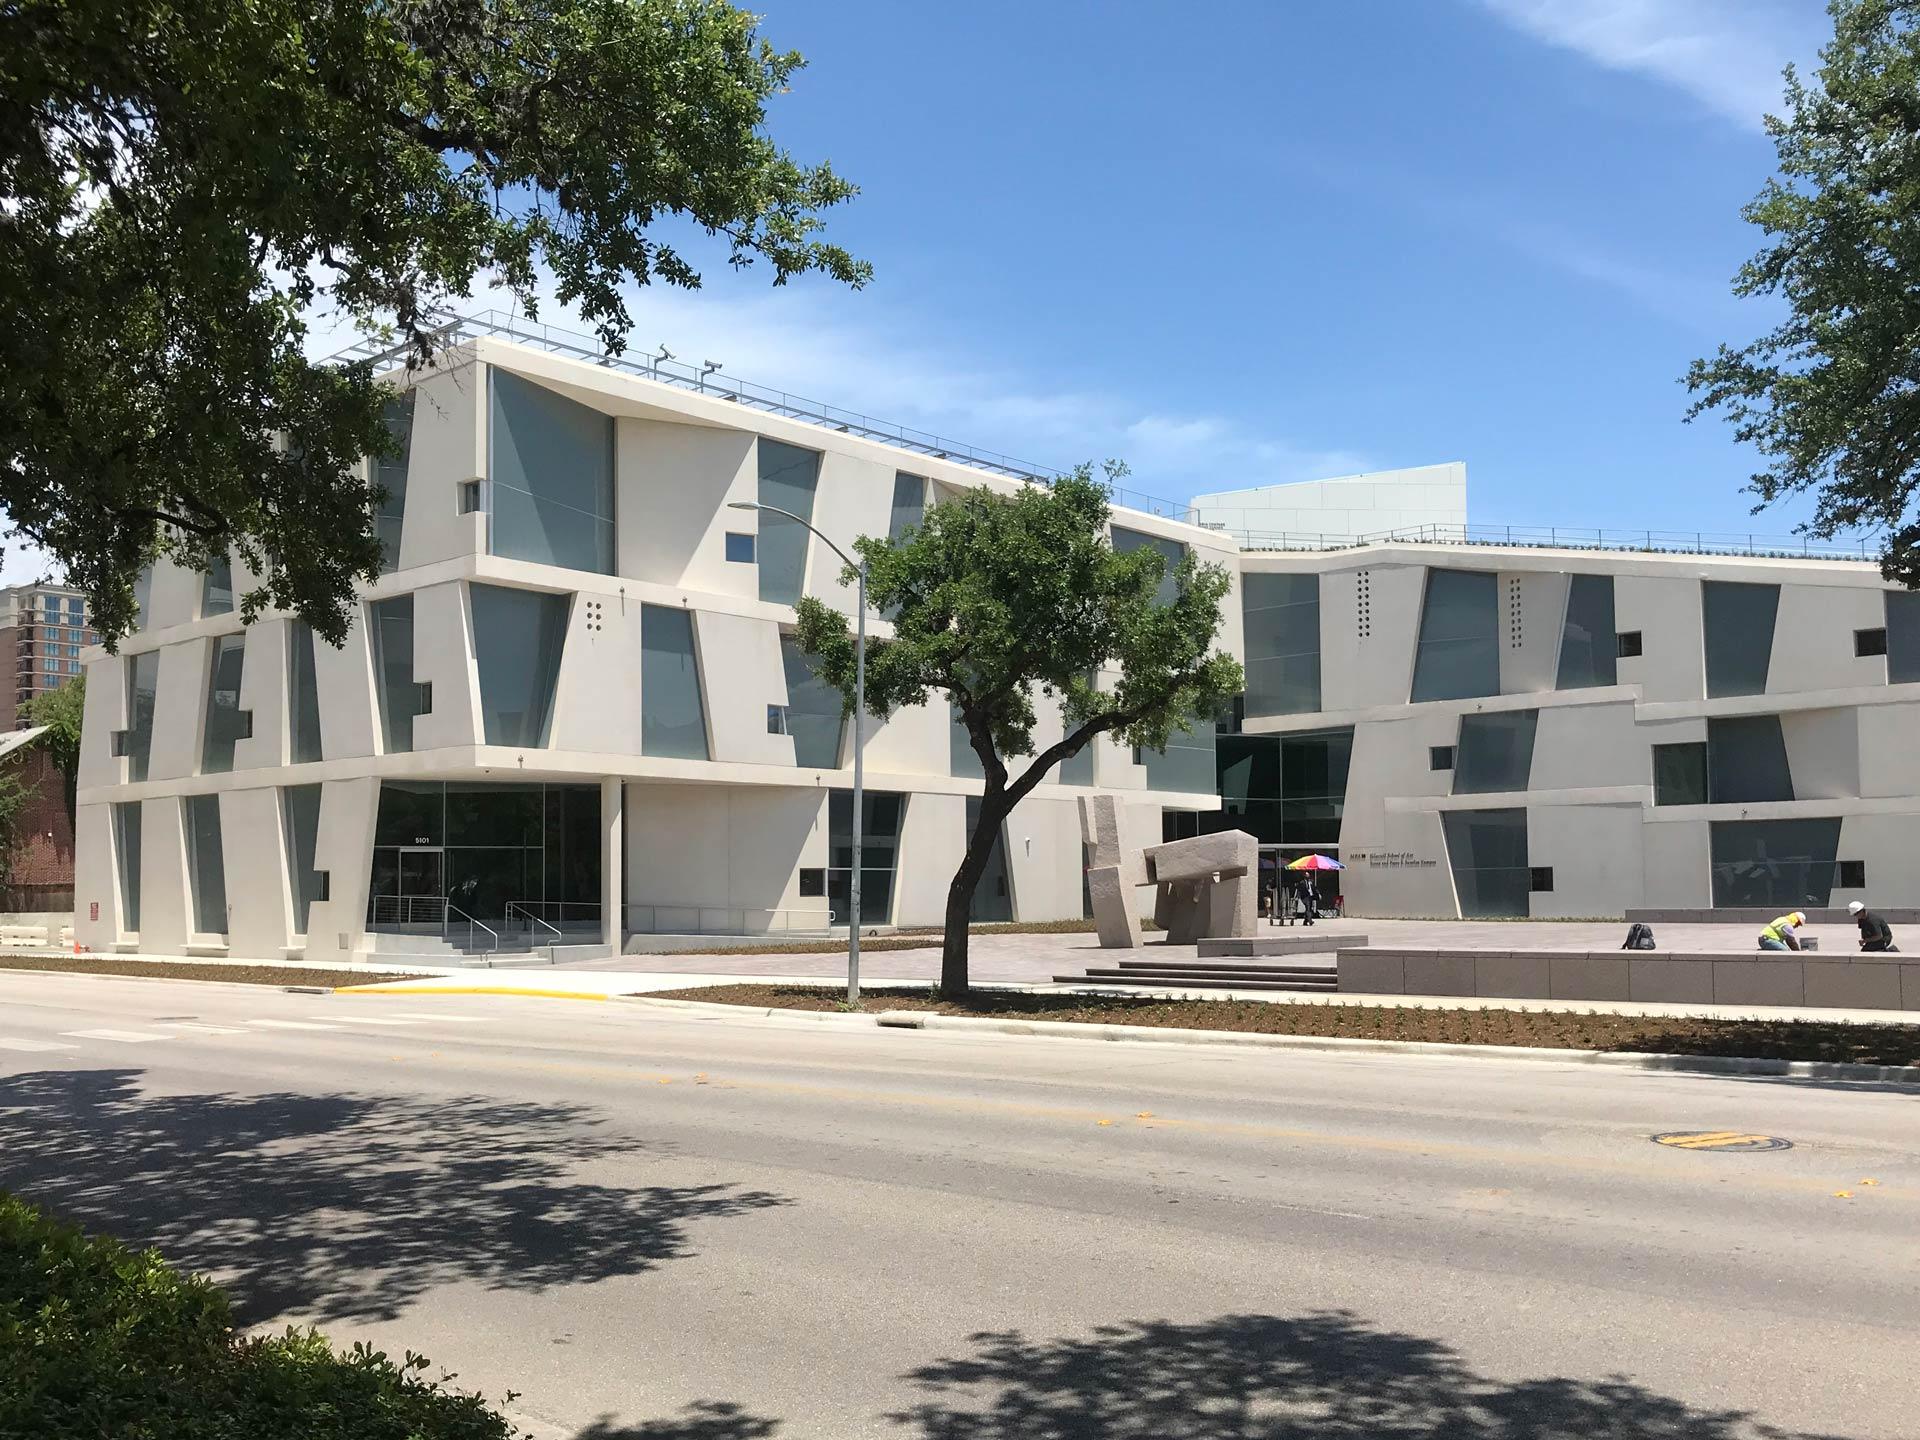 Houston Glassell School of Art MFAH